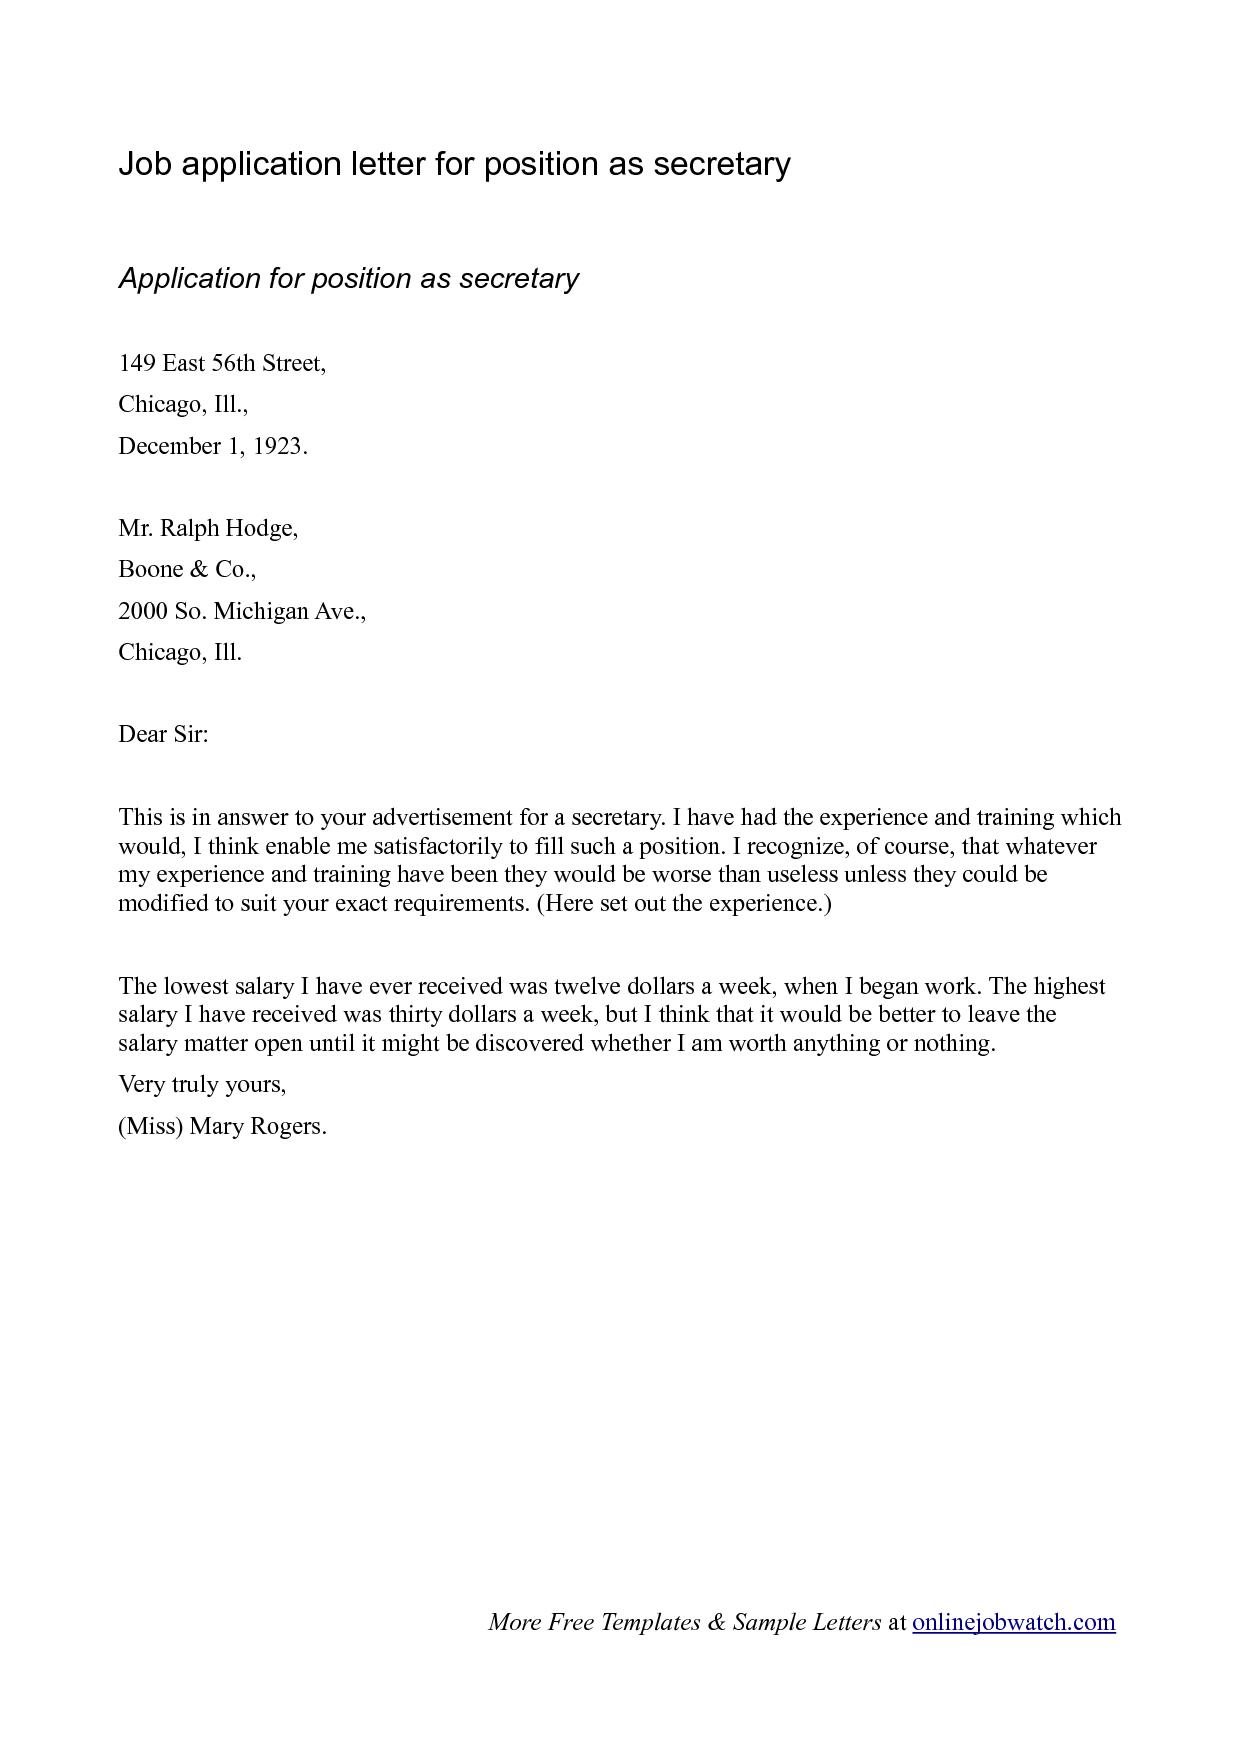 Job Application Letter Of Interest Resume Template Job